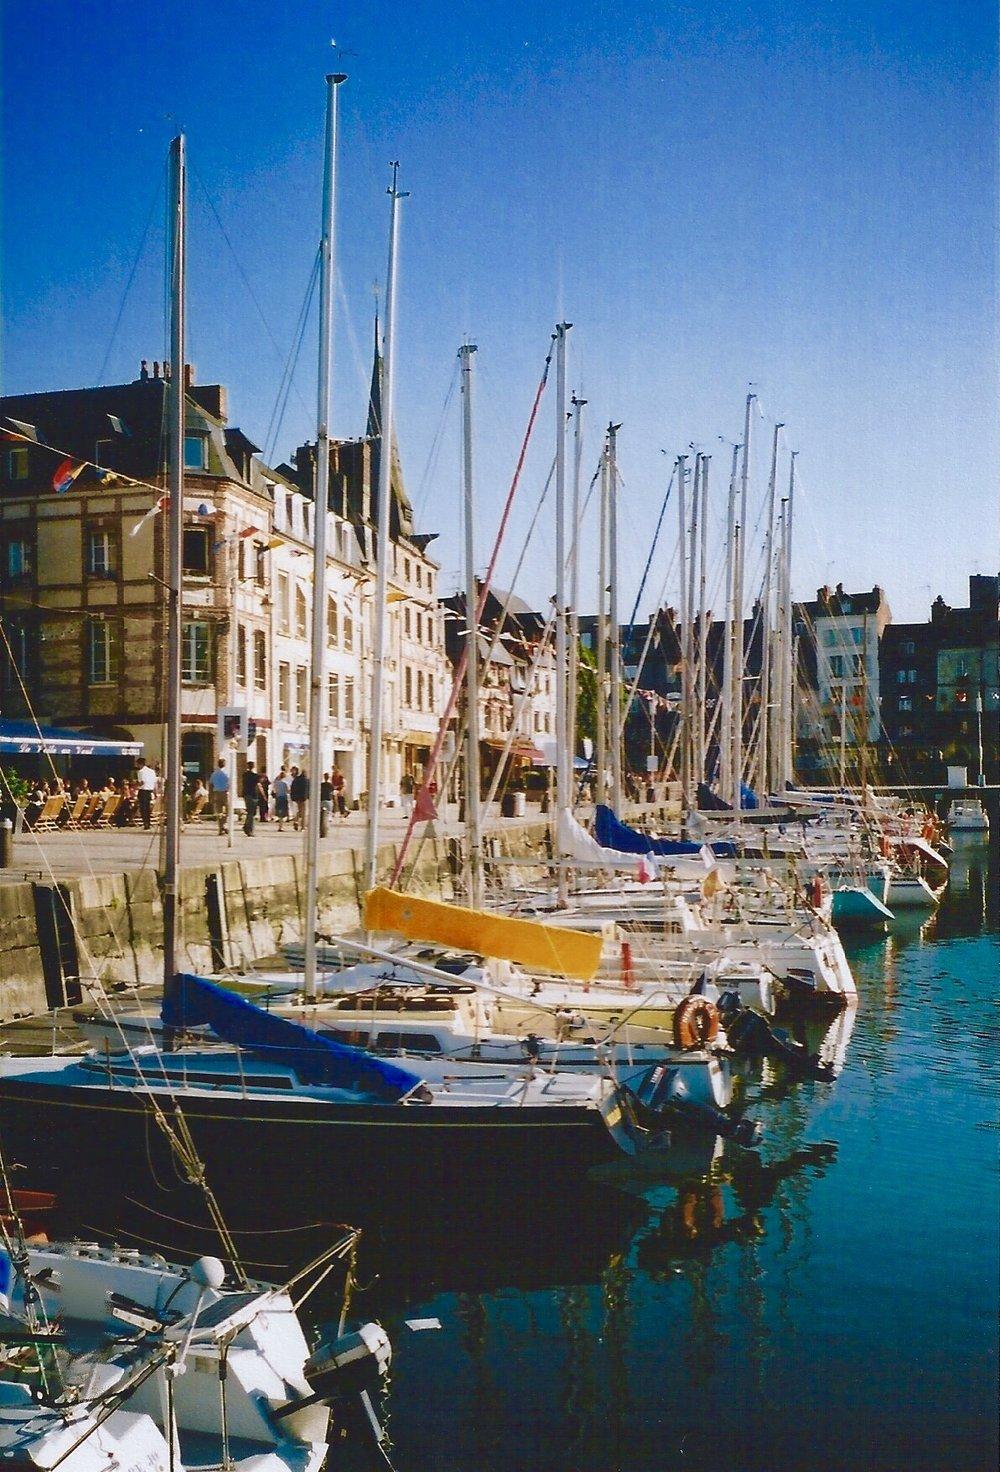 Honfleur Normandy, France